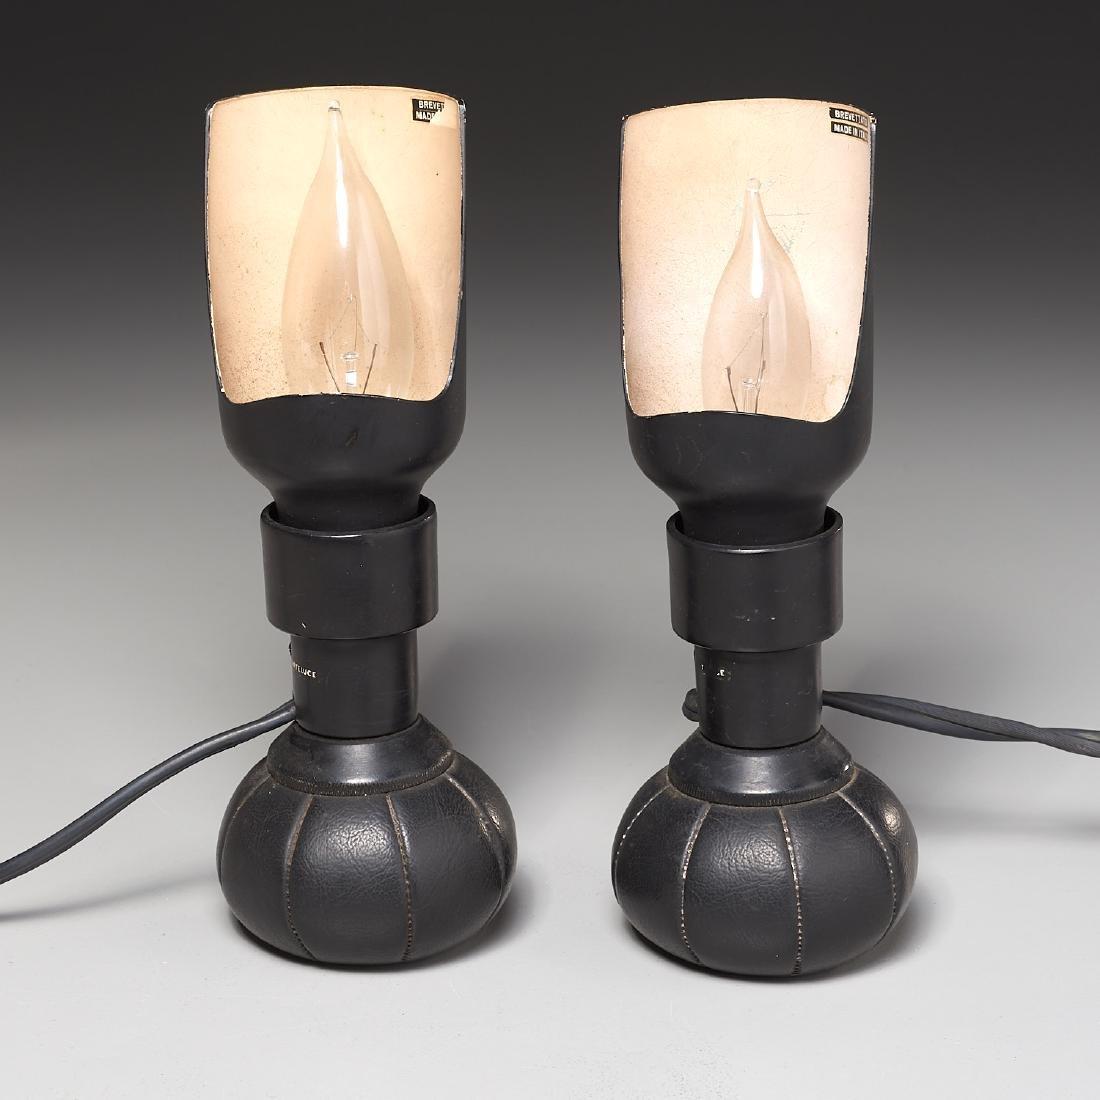 Pair Gino Sarfatti table lamps